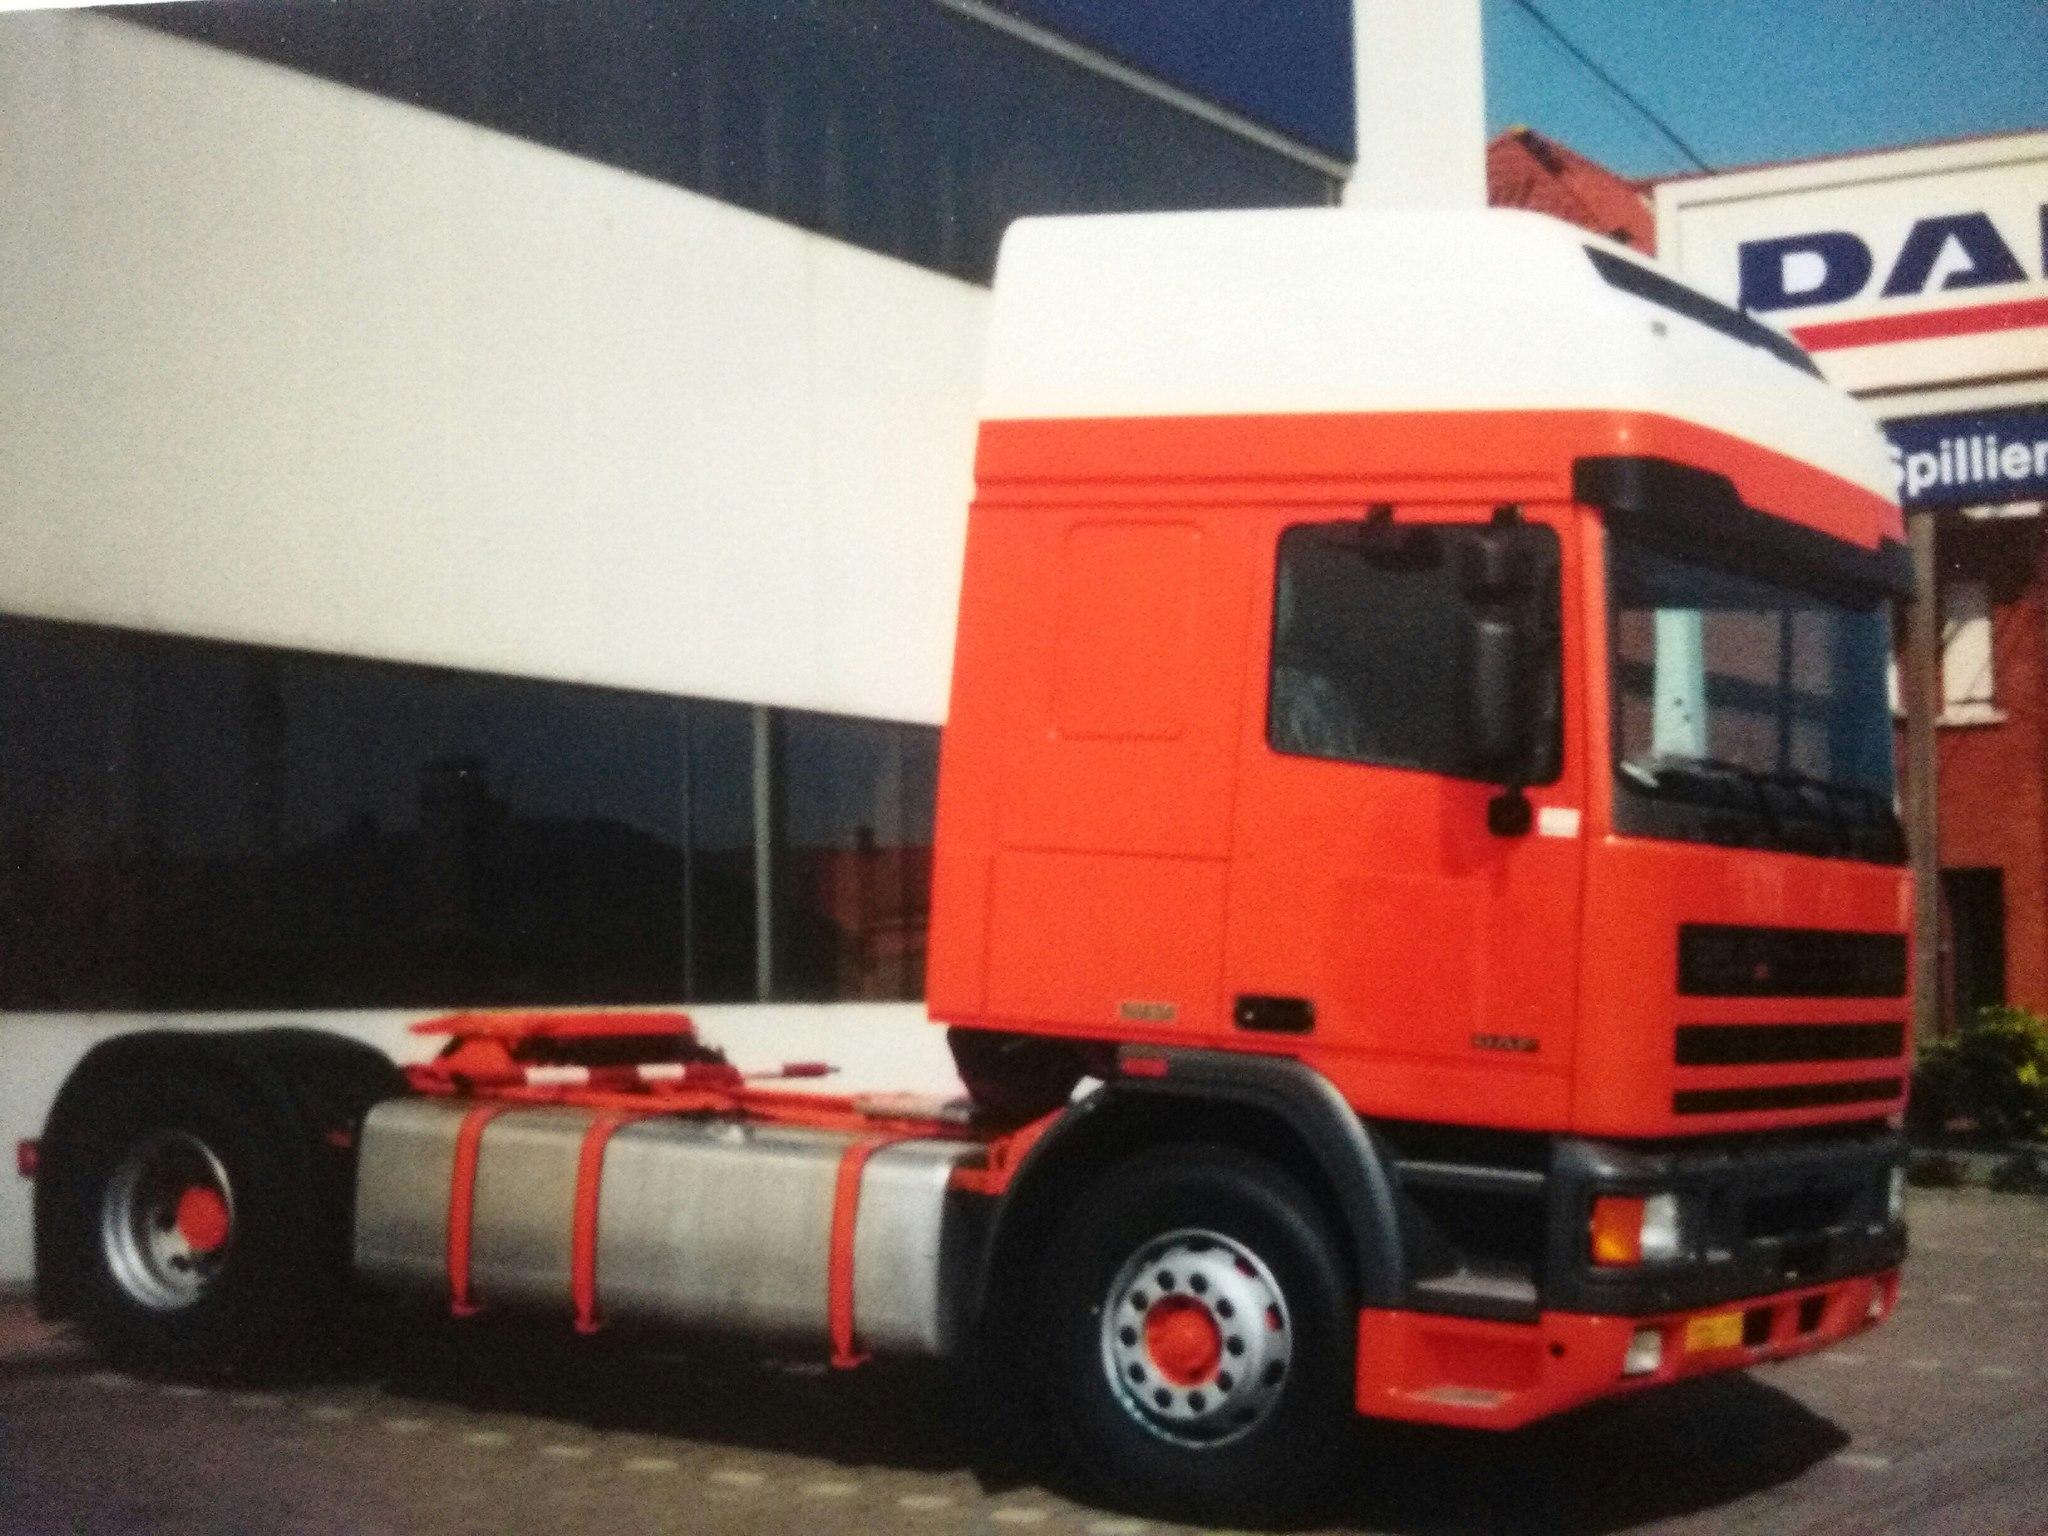 Daf-nieuw-maar-is-voor-Sitra--Spilier-DAF-Torhout-96-97